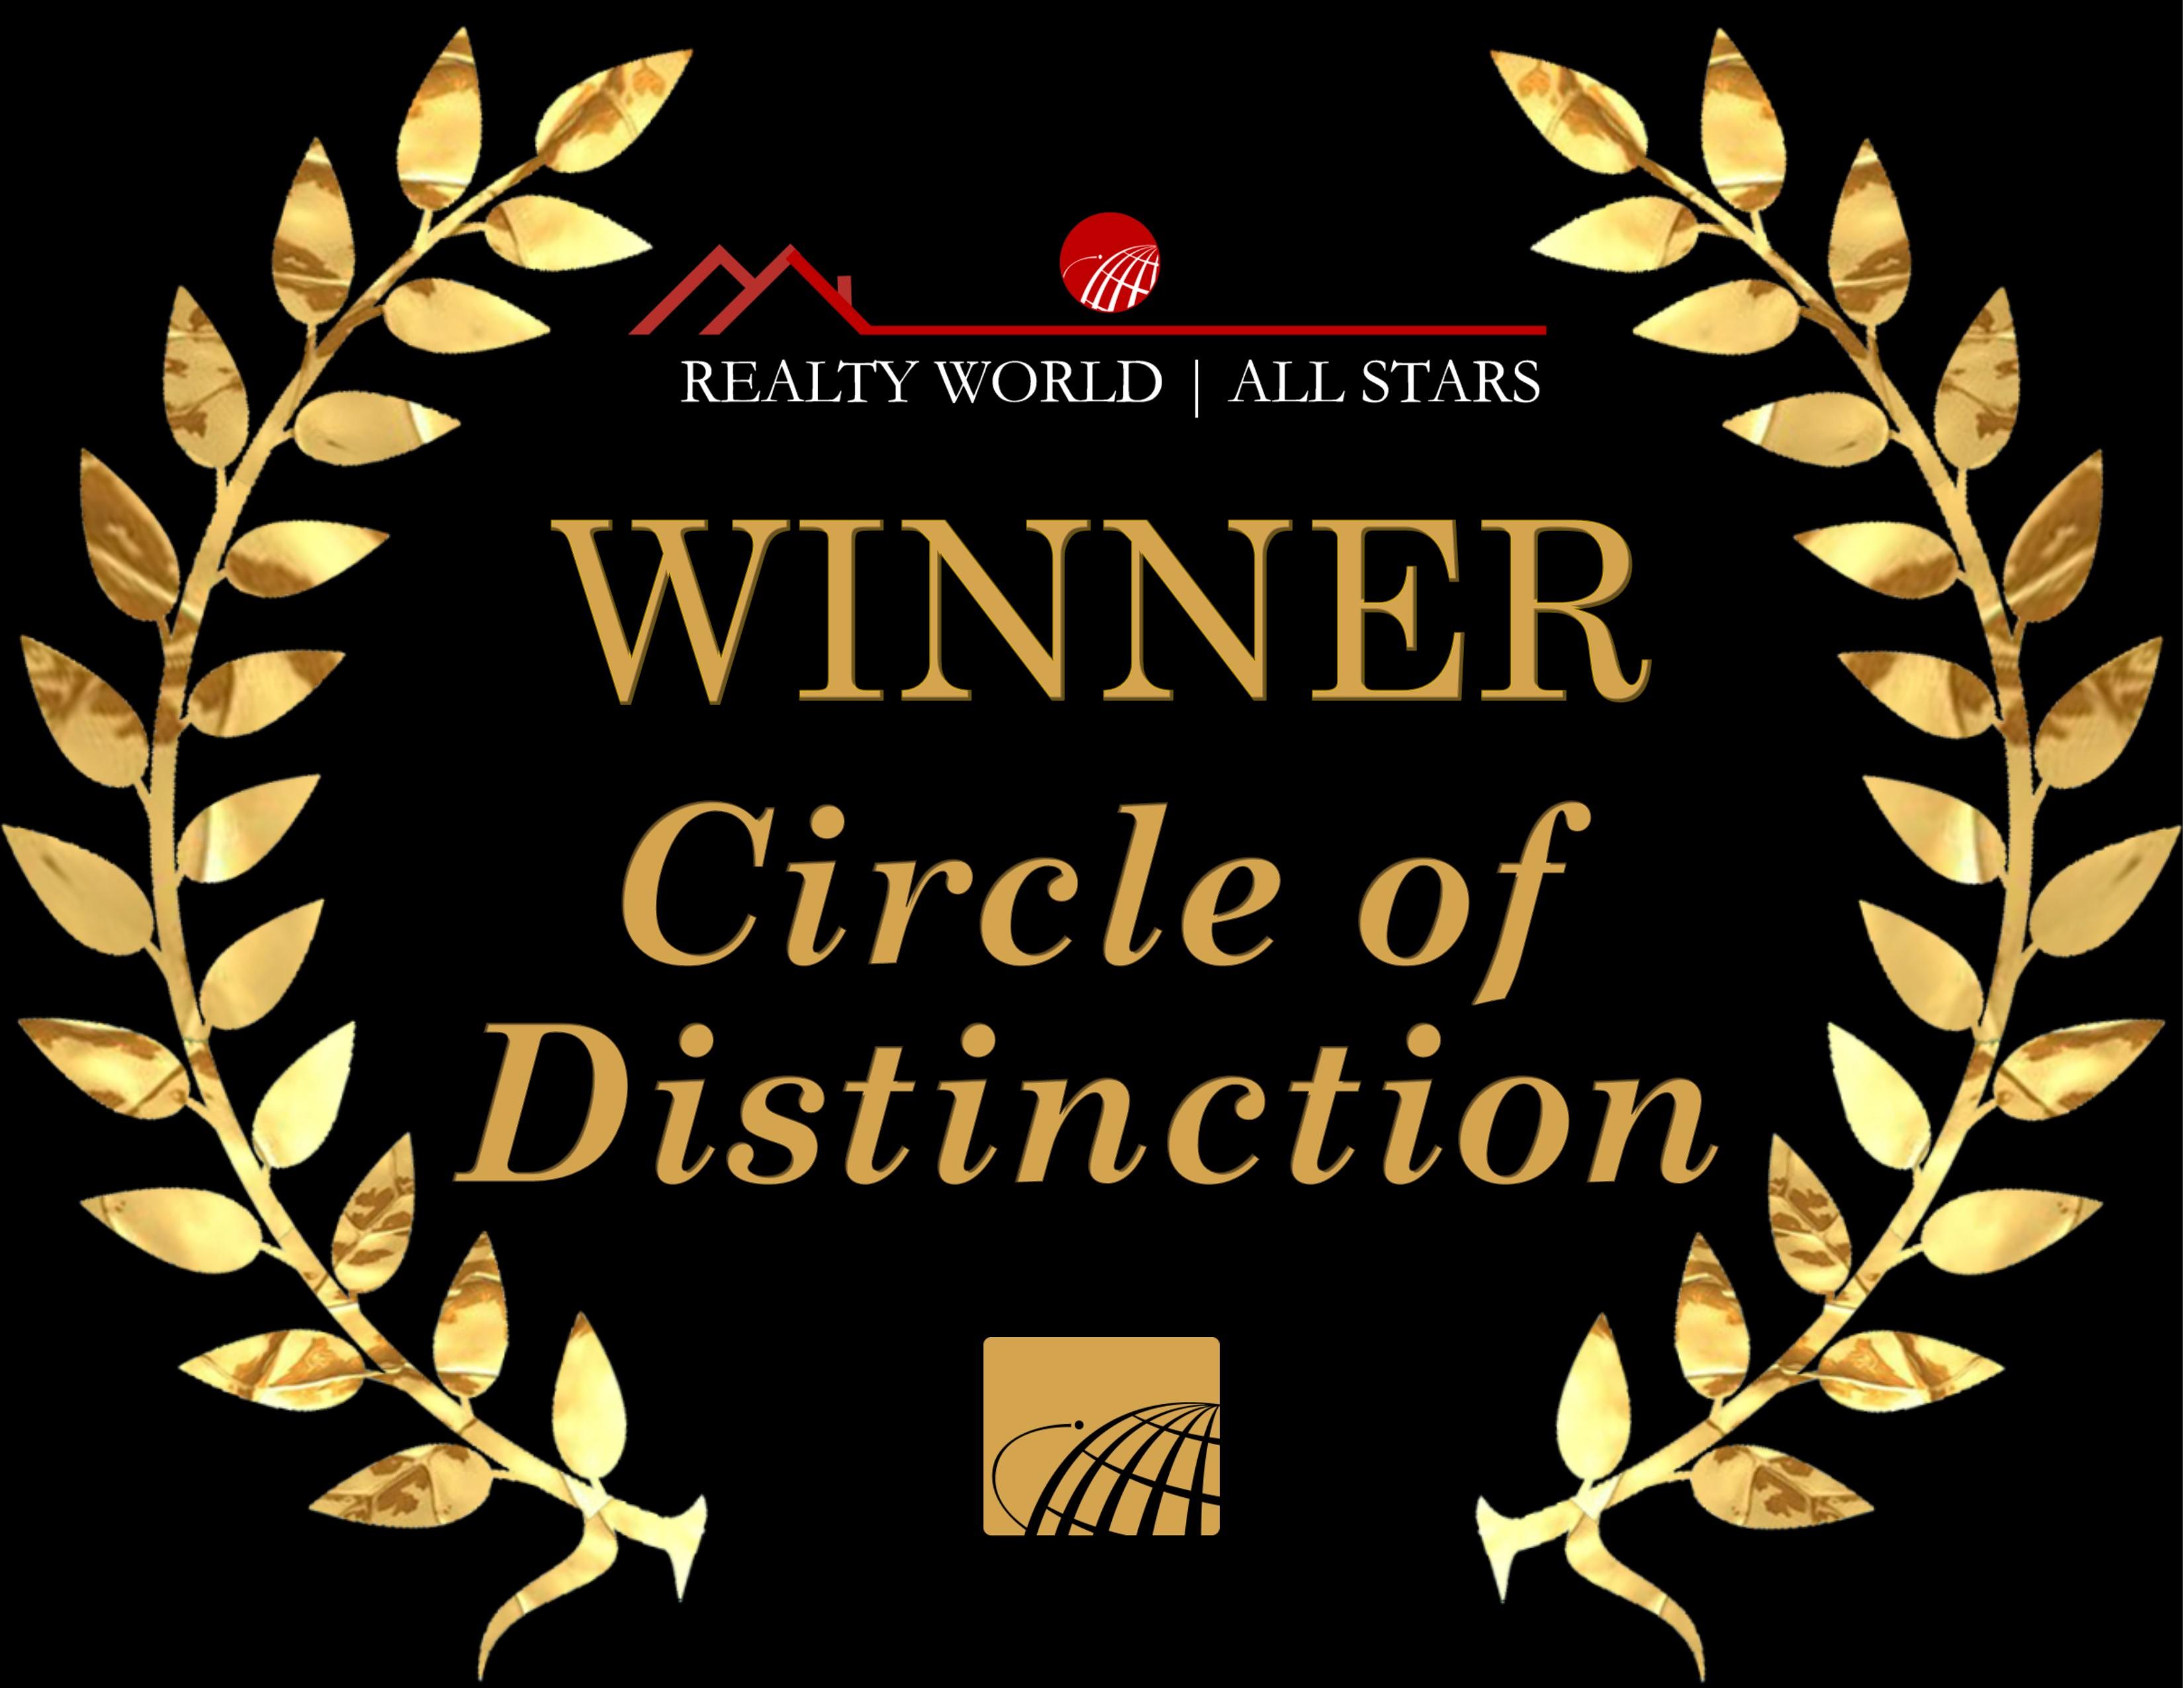 Circle of Distinction